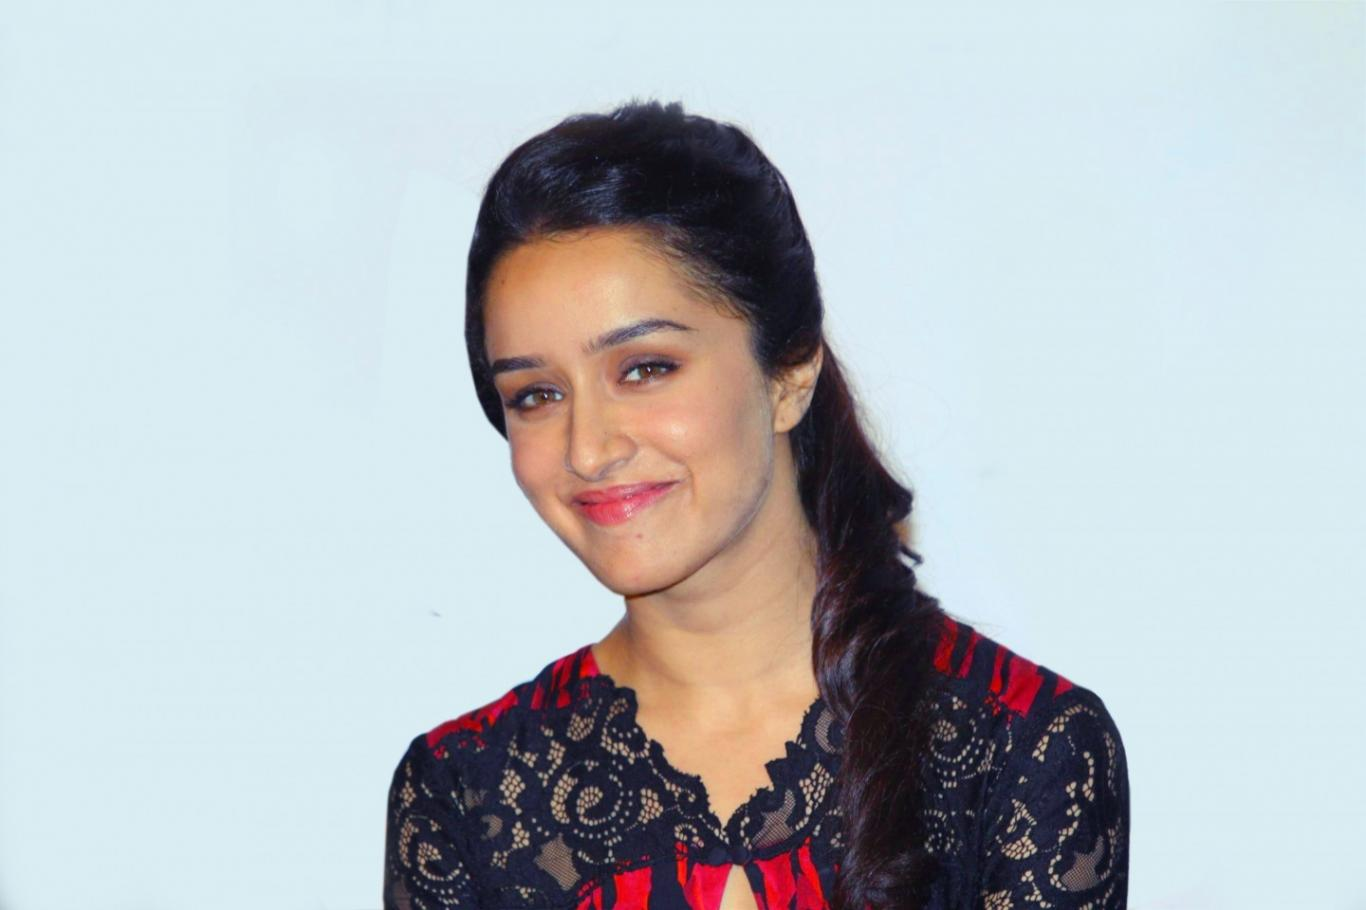 Download Shraddha Kapoors Cute Smile Wallpaper HD FREE Uploaded 1366x910